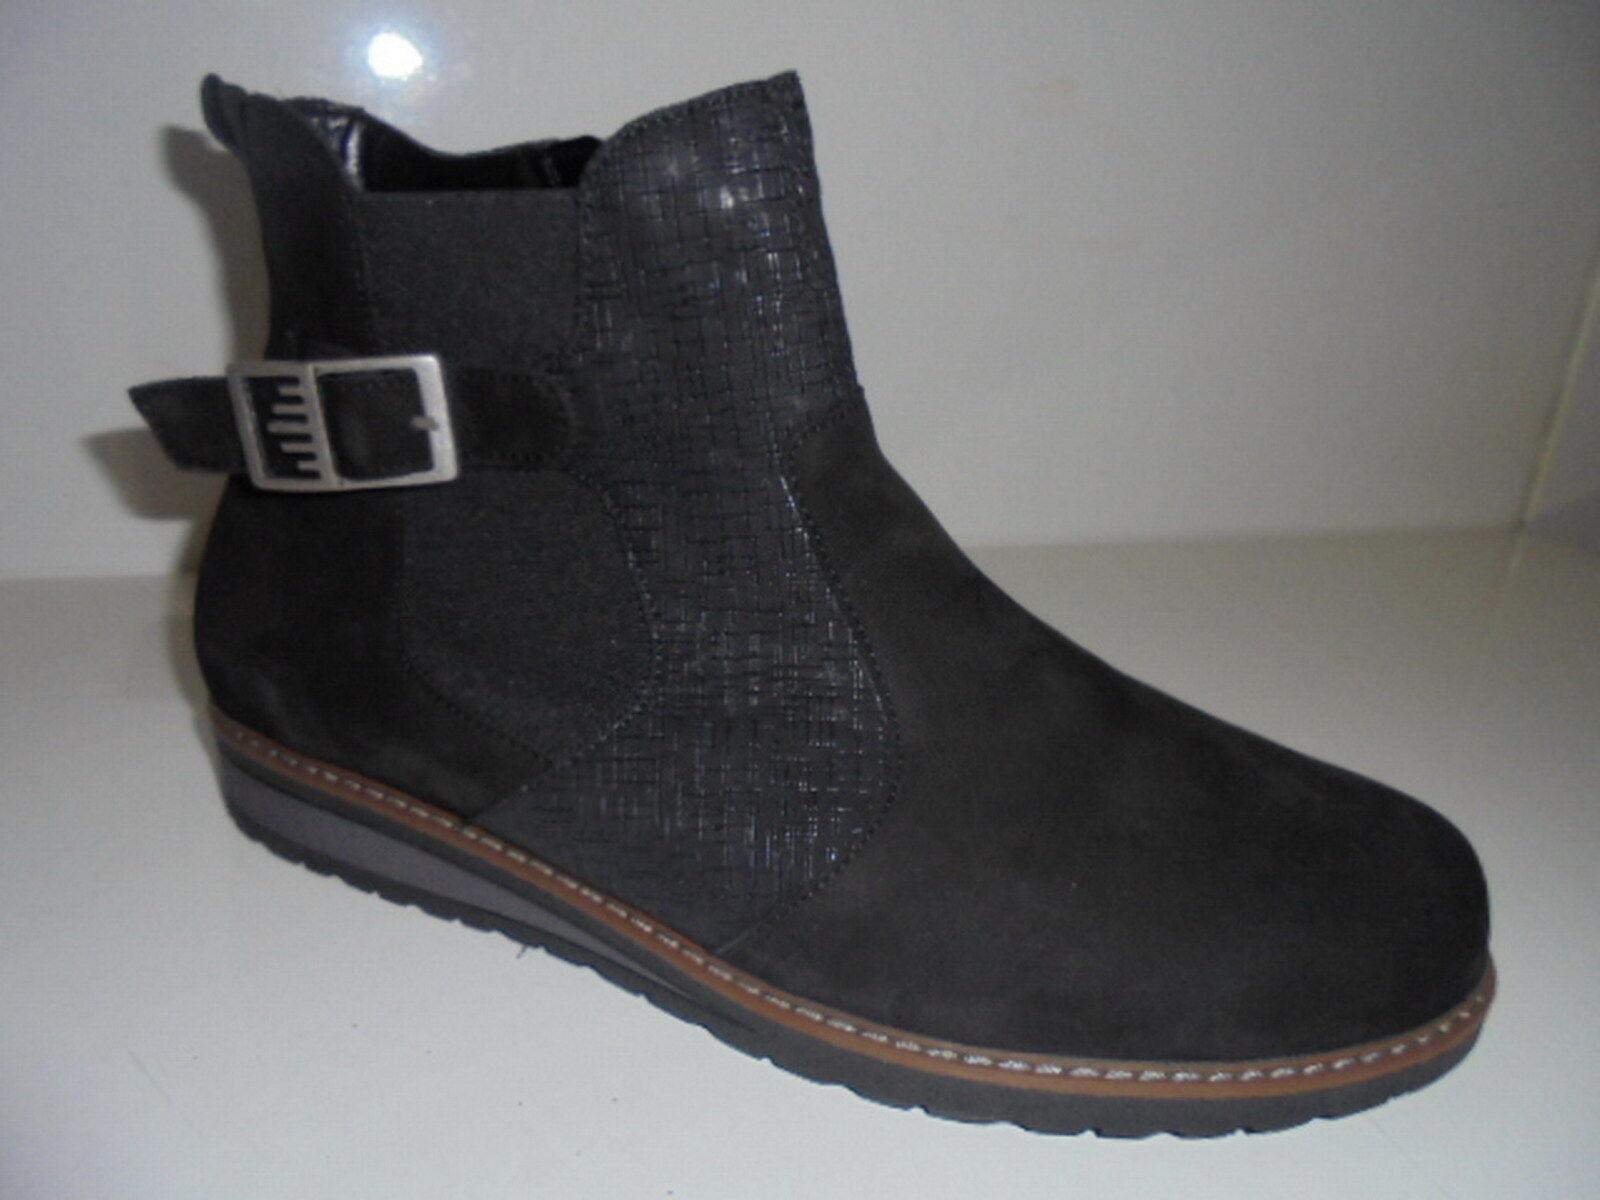 675816 Waldläufer Damenstiefelette Boots Warmfutter Leder schwarz UK 9 Gr.43